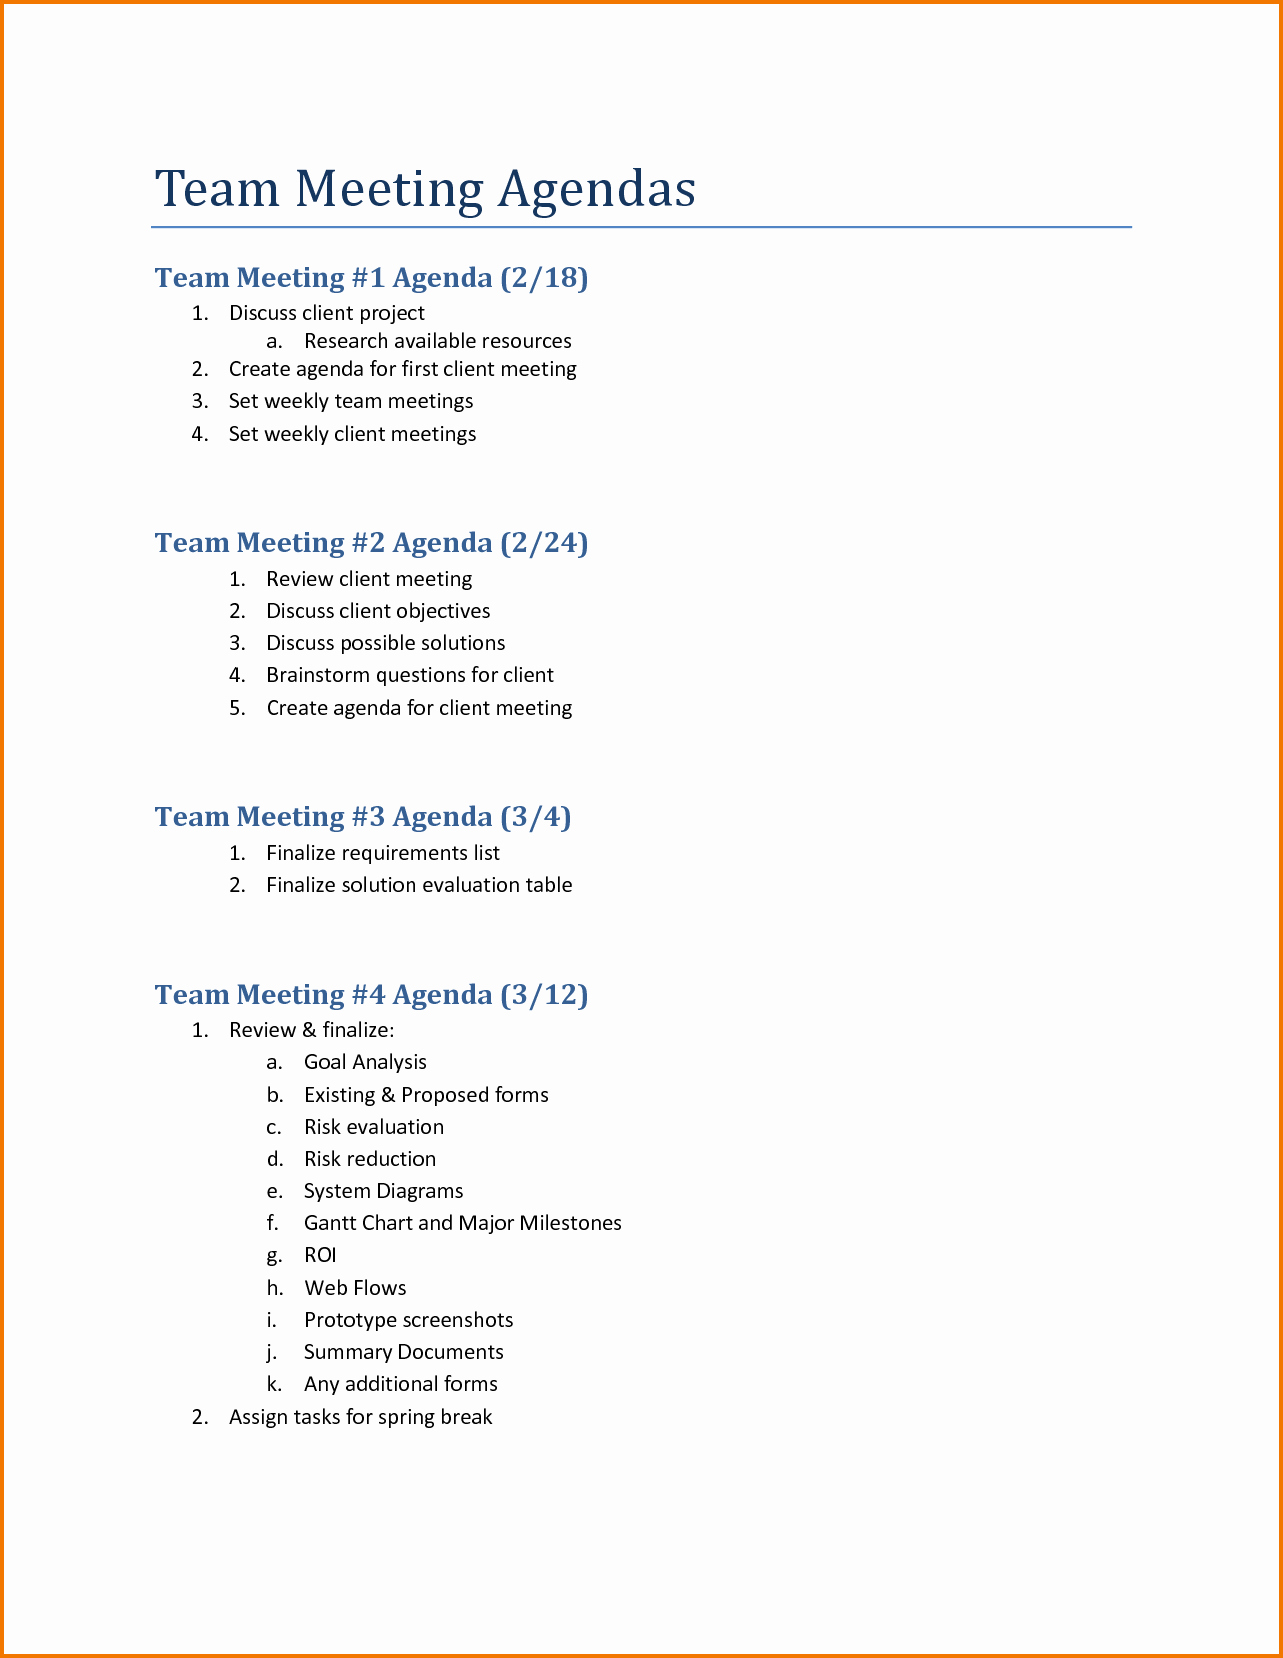 Team Meeting Agenda Template Word Luxury 5 Team Meeting Agenda Template